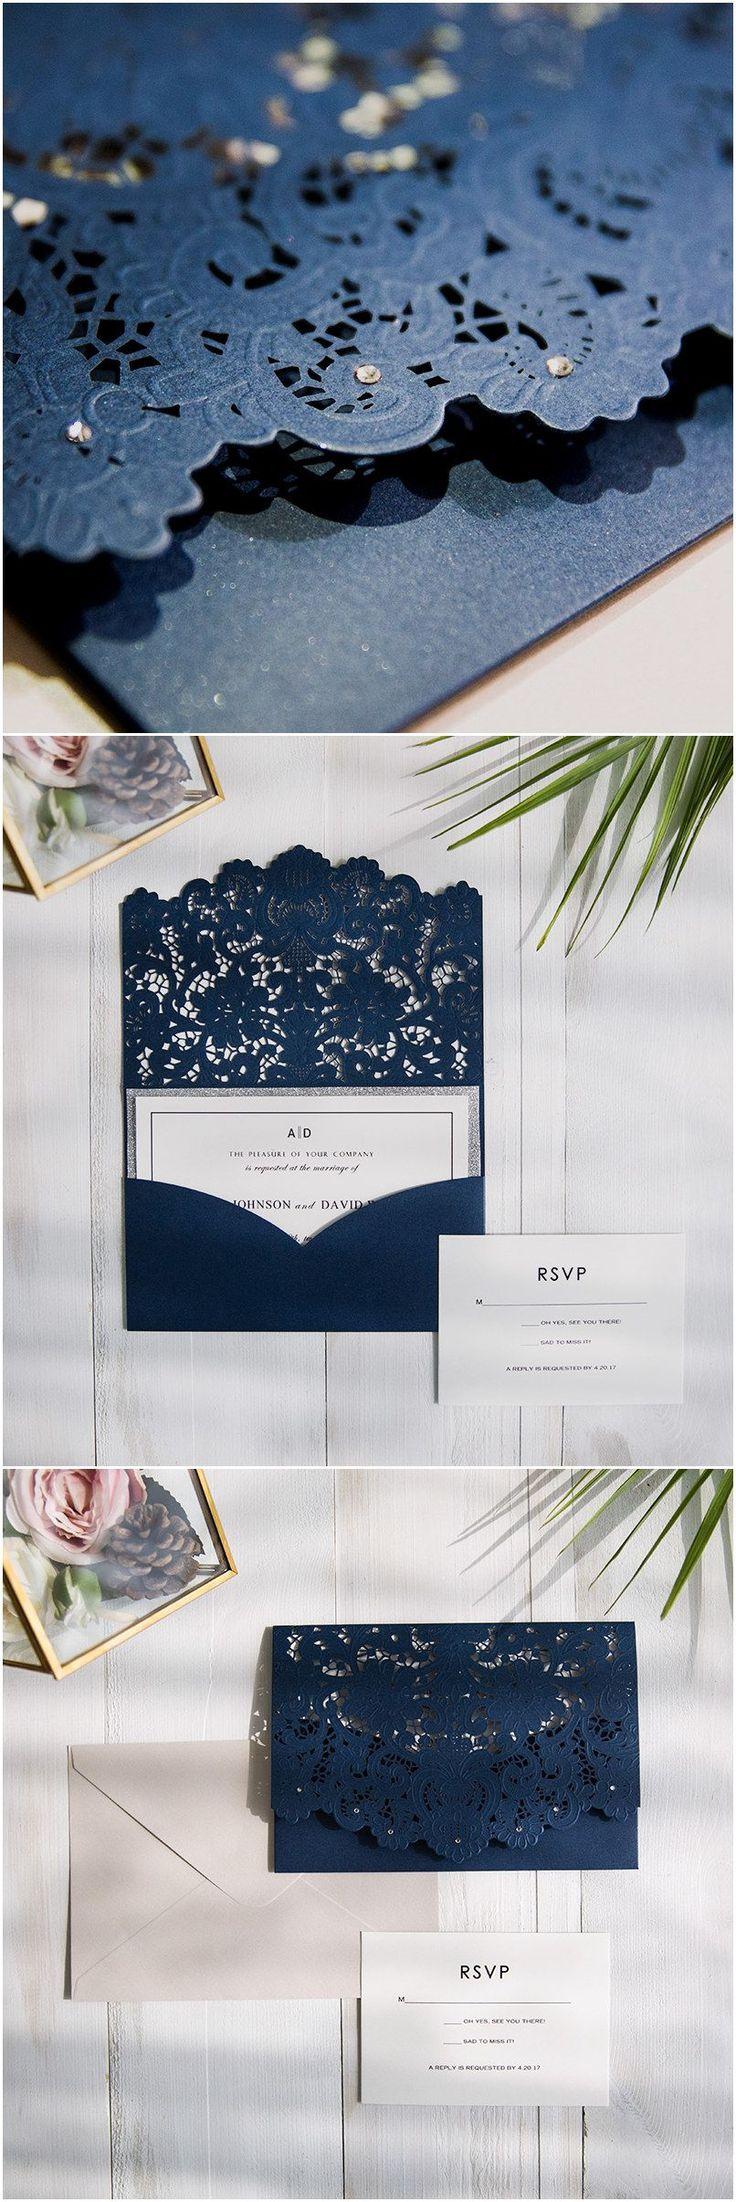 monogram wedding envelope seals sticker%0A resume examples finance entry level